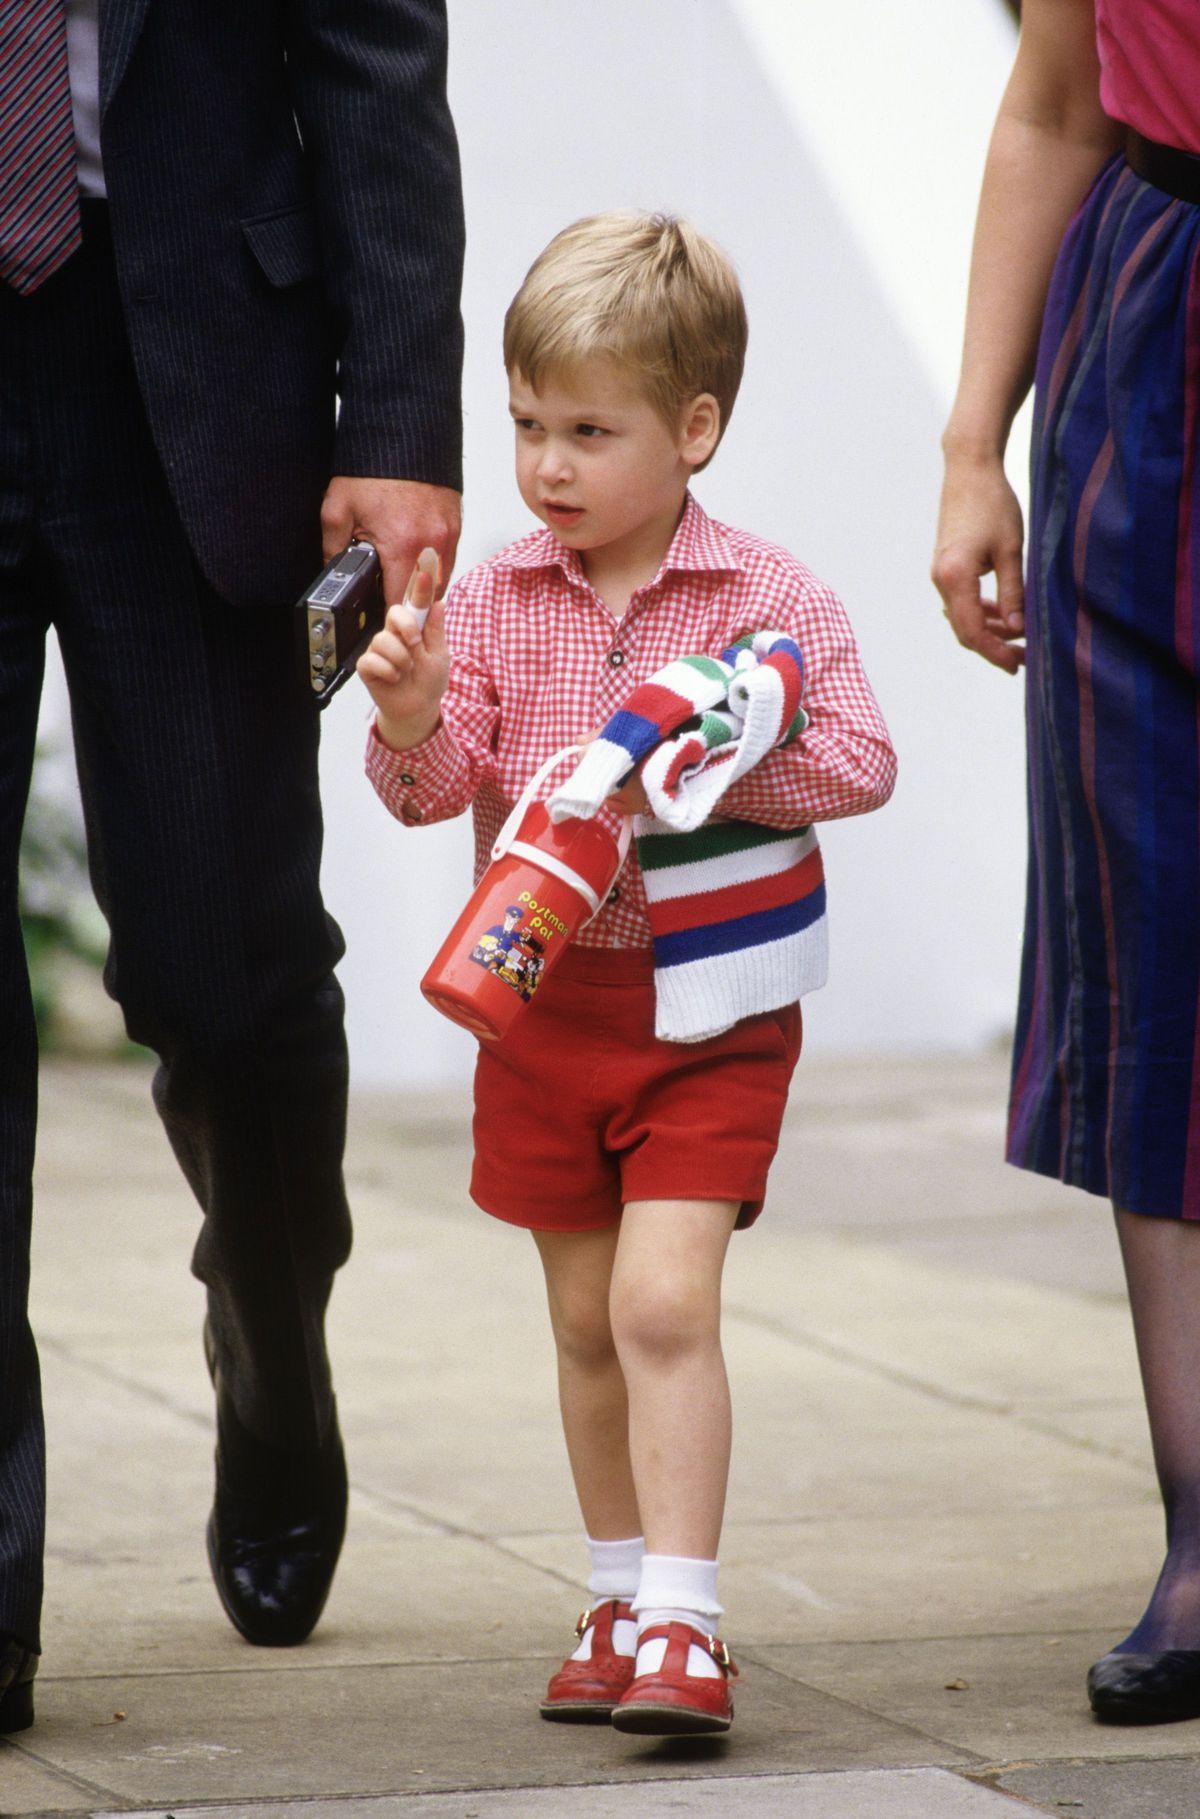 hoàng tử george 11